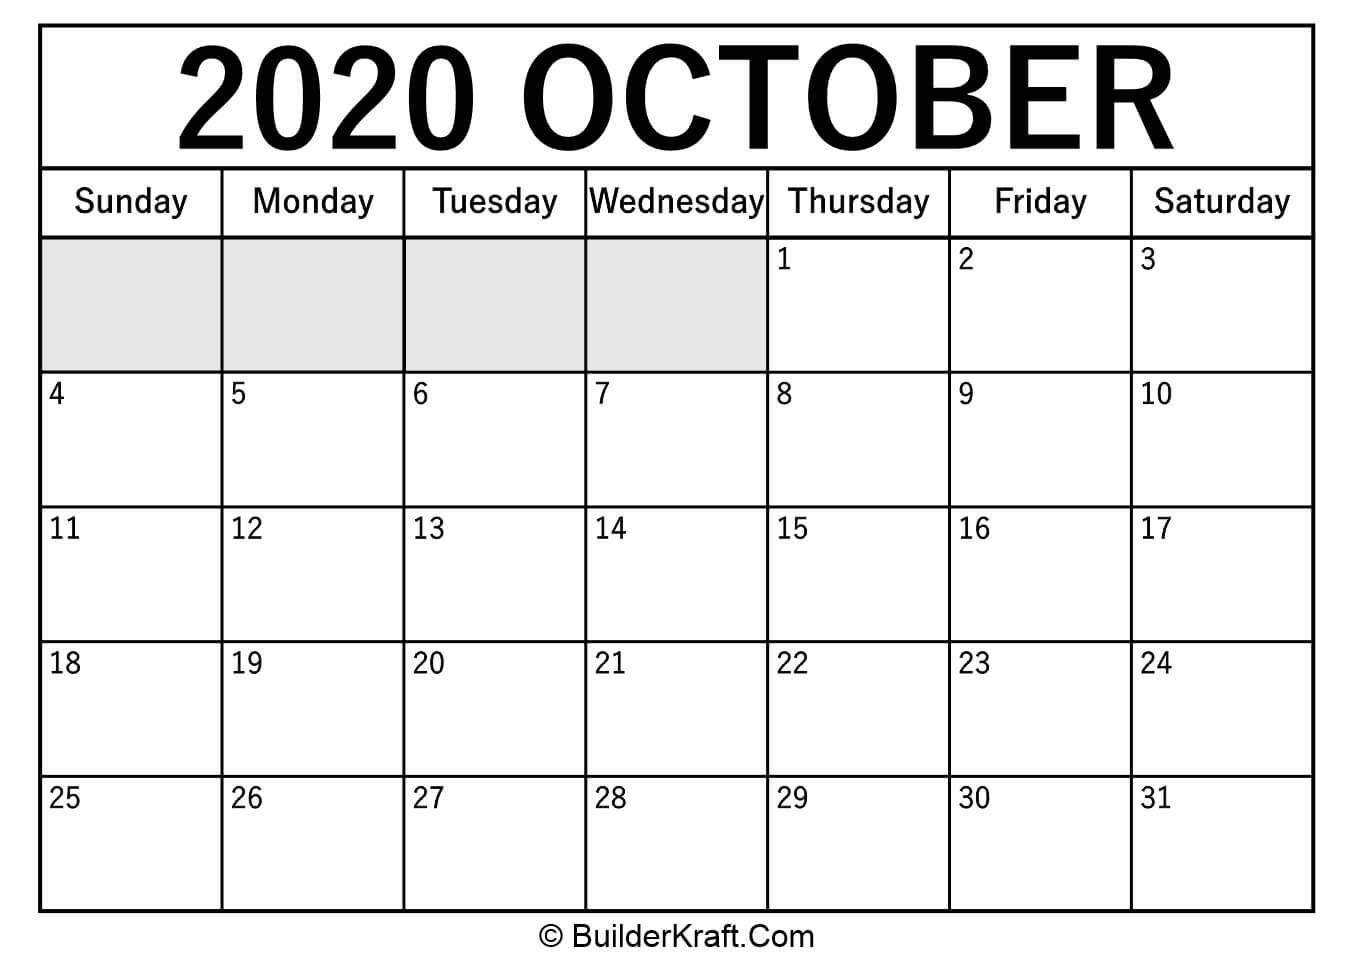 October January 2020 Calendar